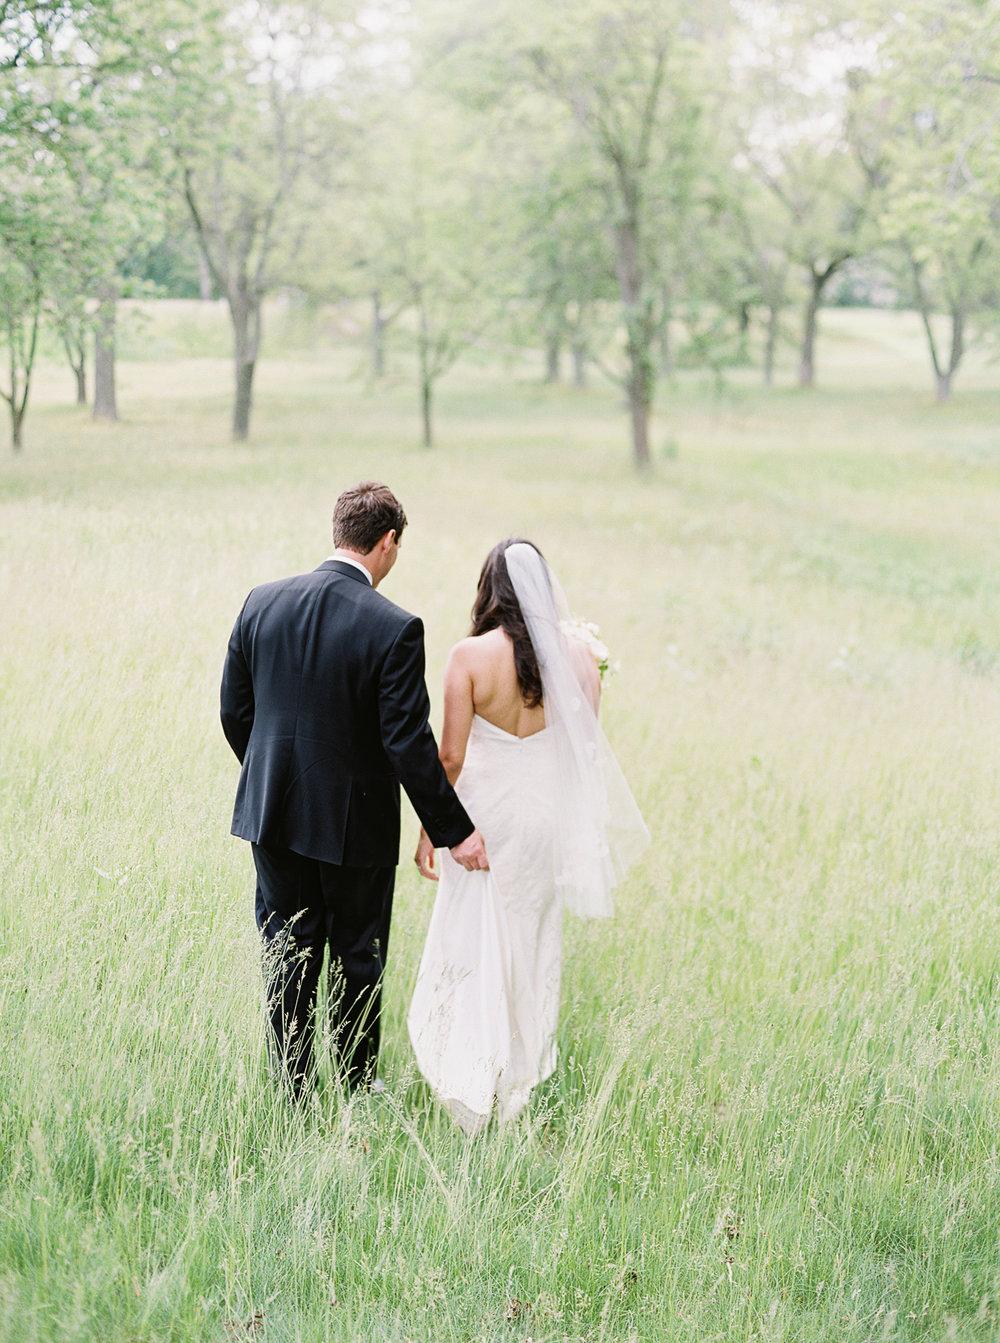 0627-Nadia-Chris-Married-When He Founf Her-Toronto Golf Club.jpg